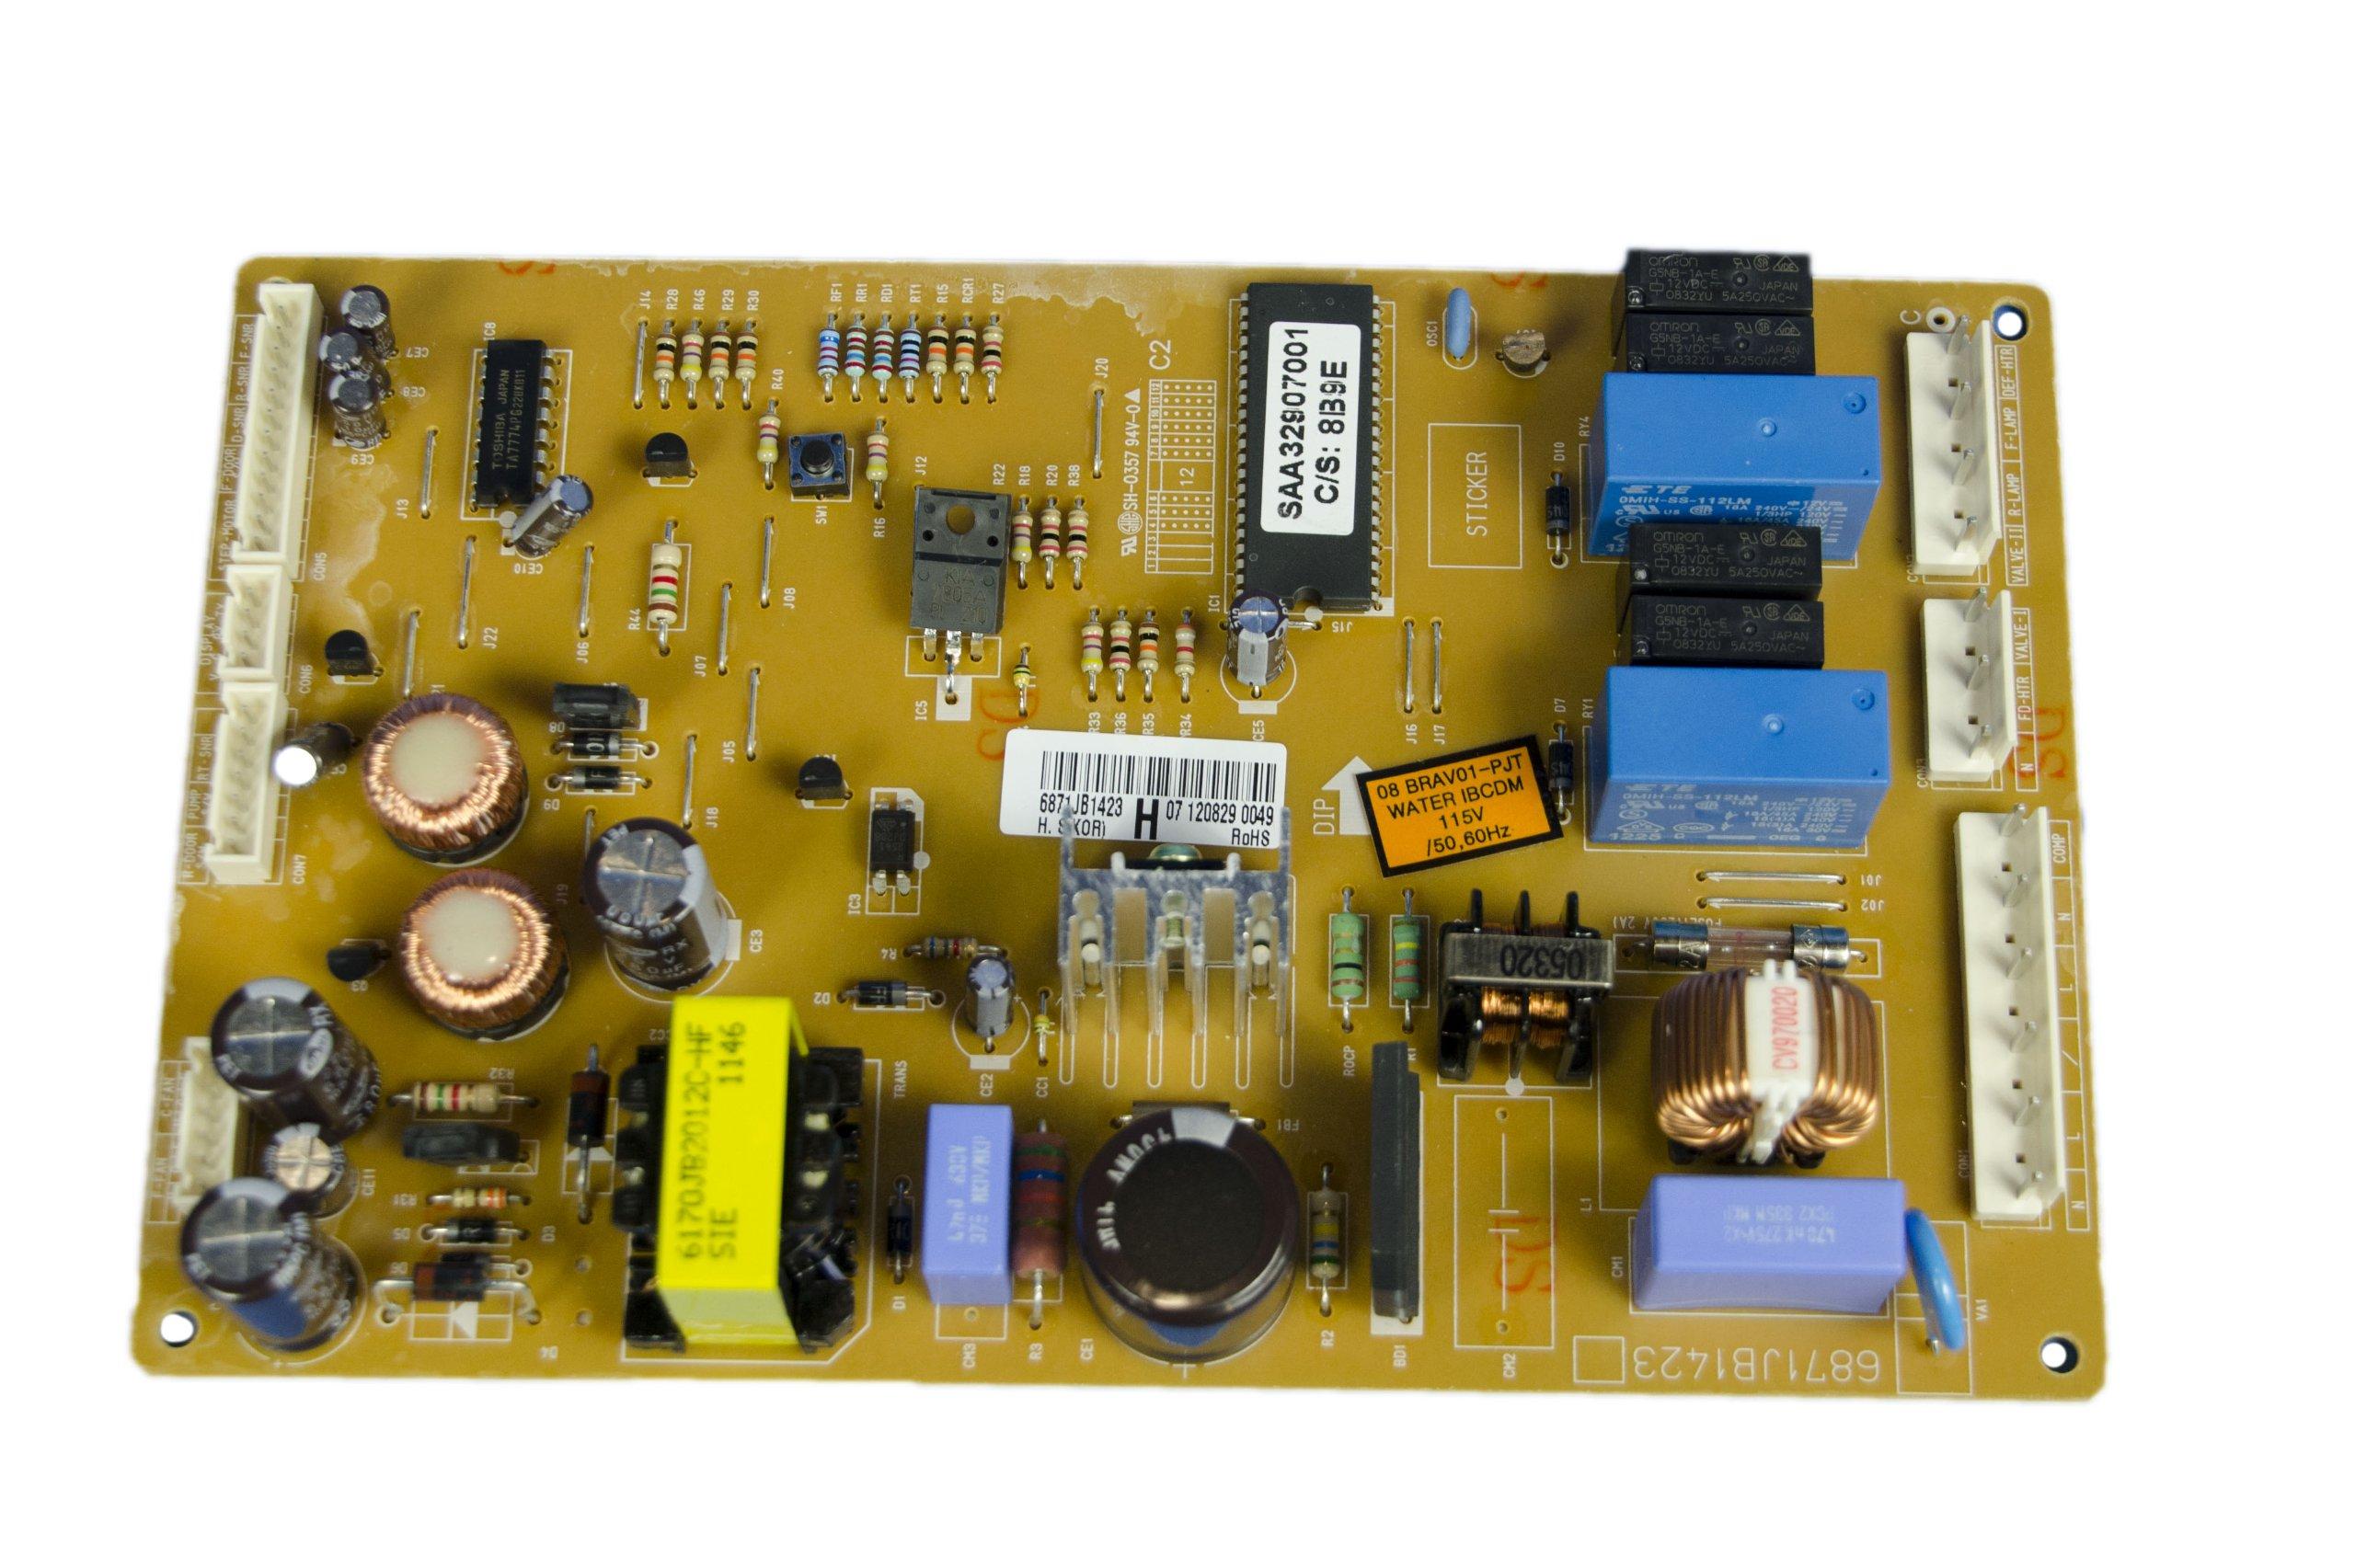 LG Electronics 6871JB1423H Refrigerator Main PCB Assembly